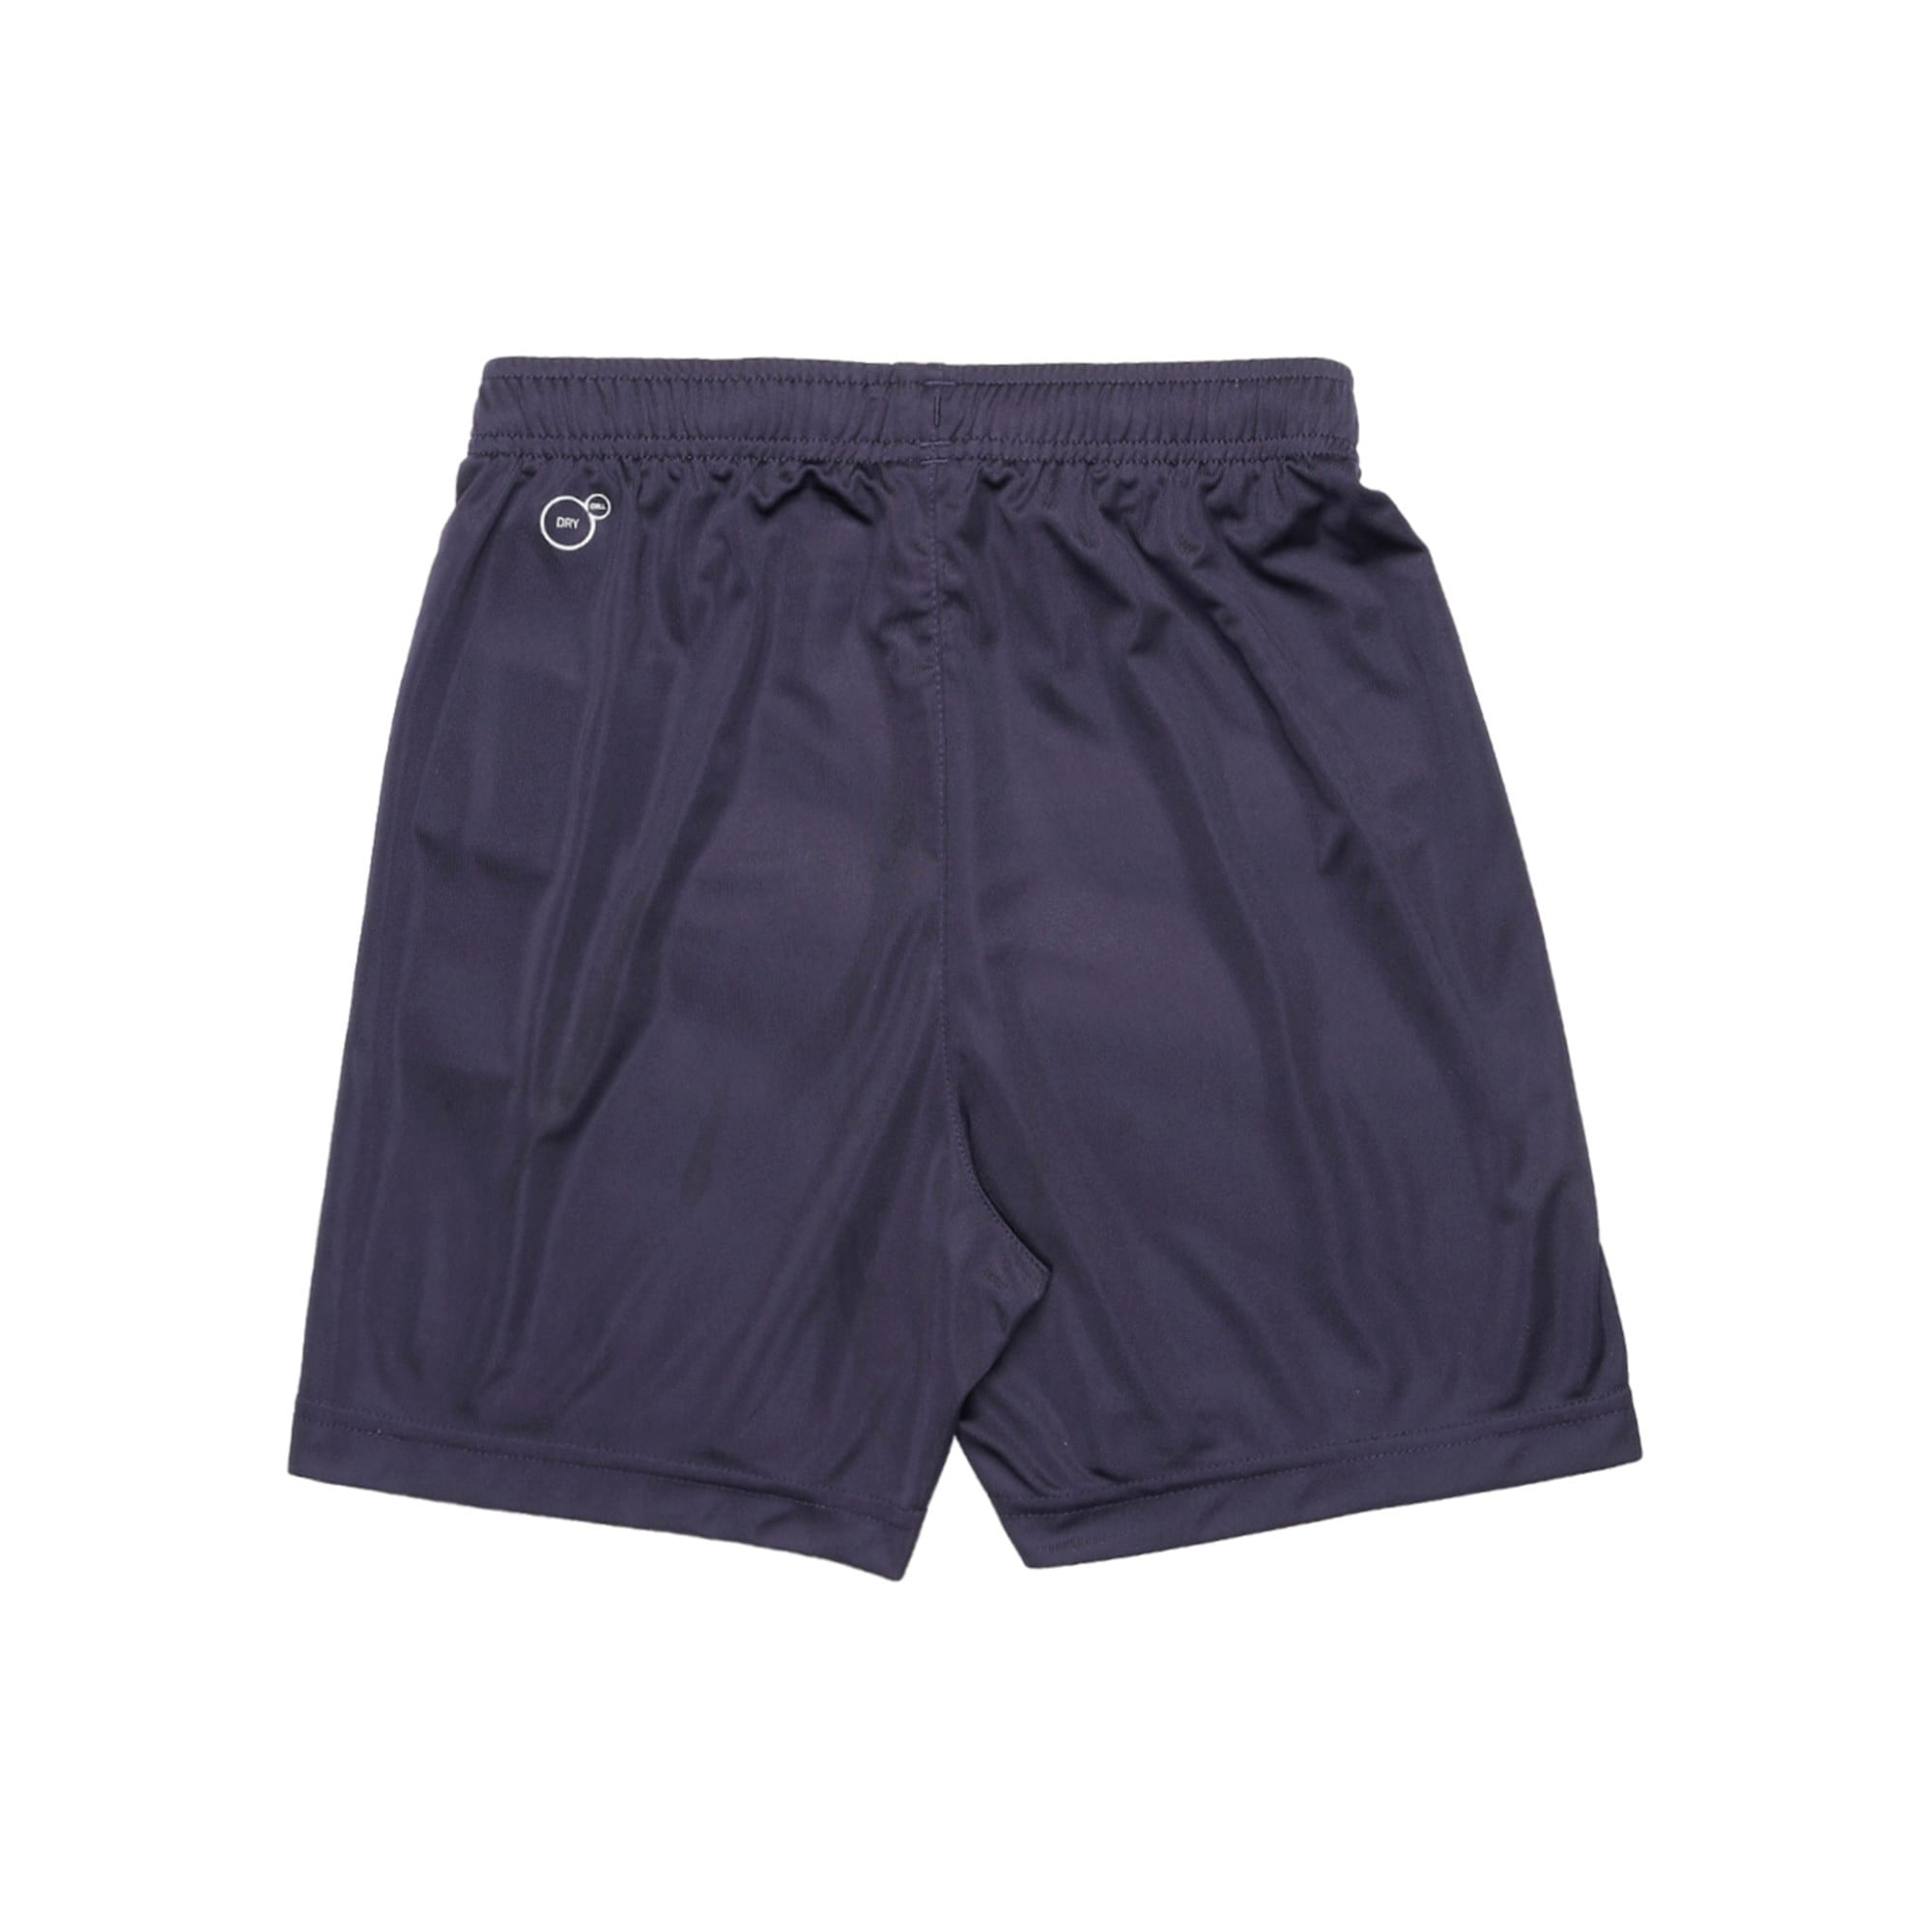 Thumbnail 3 of ftblPLAY Kids' Shorts, Puma New Navy, medium-IND